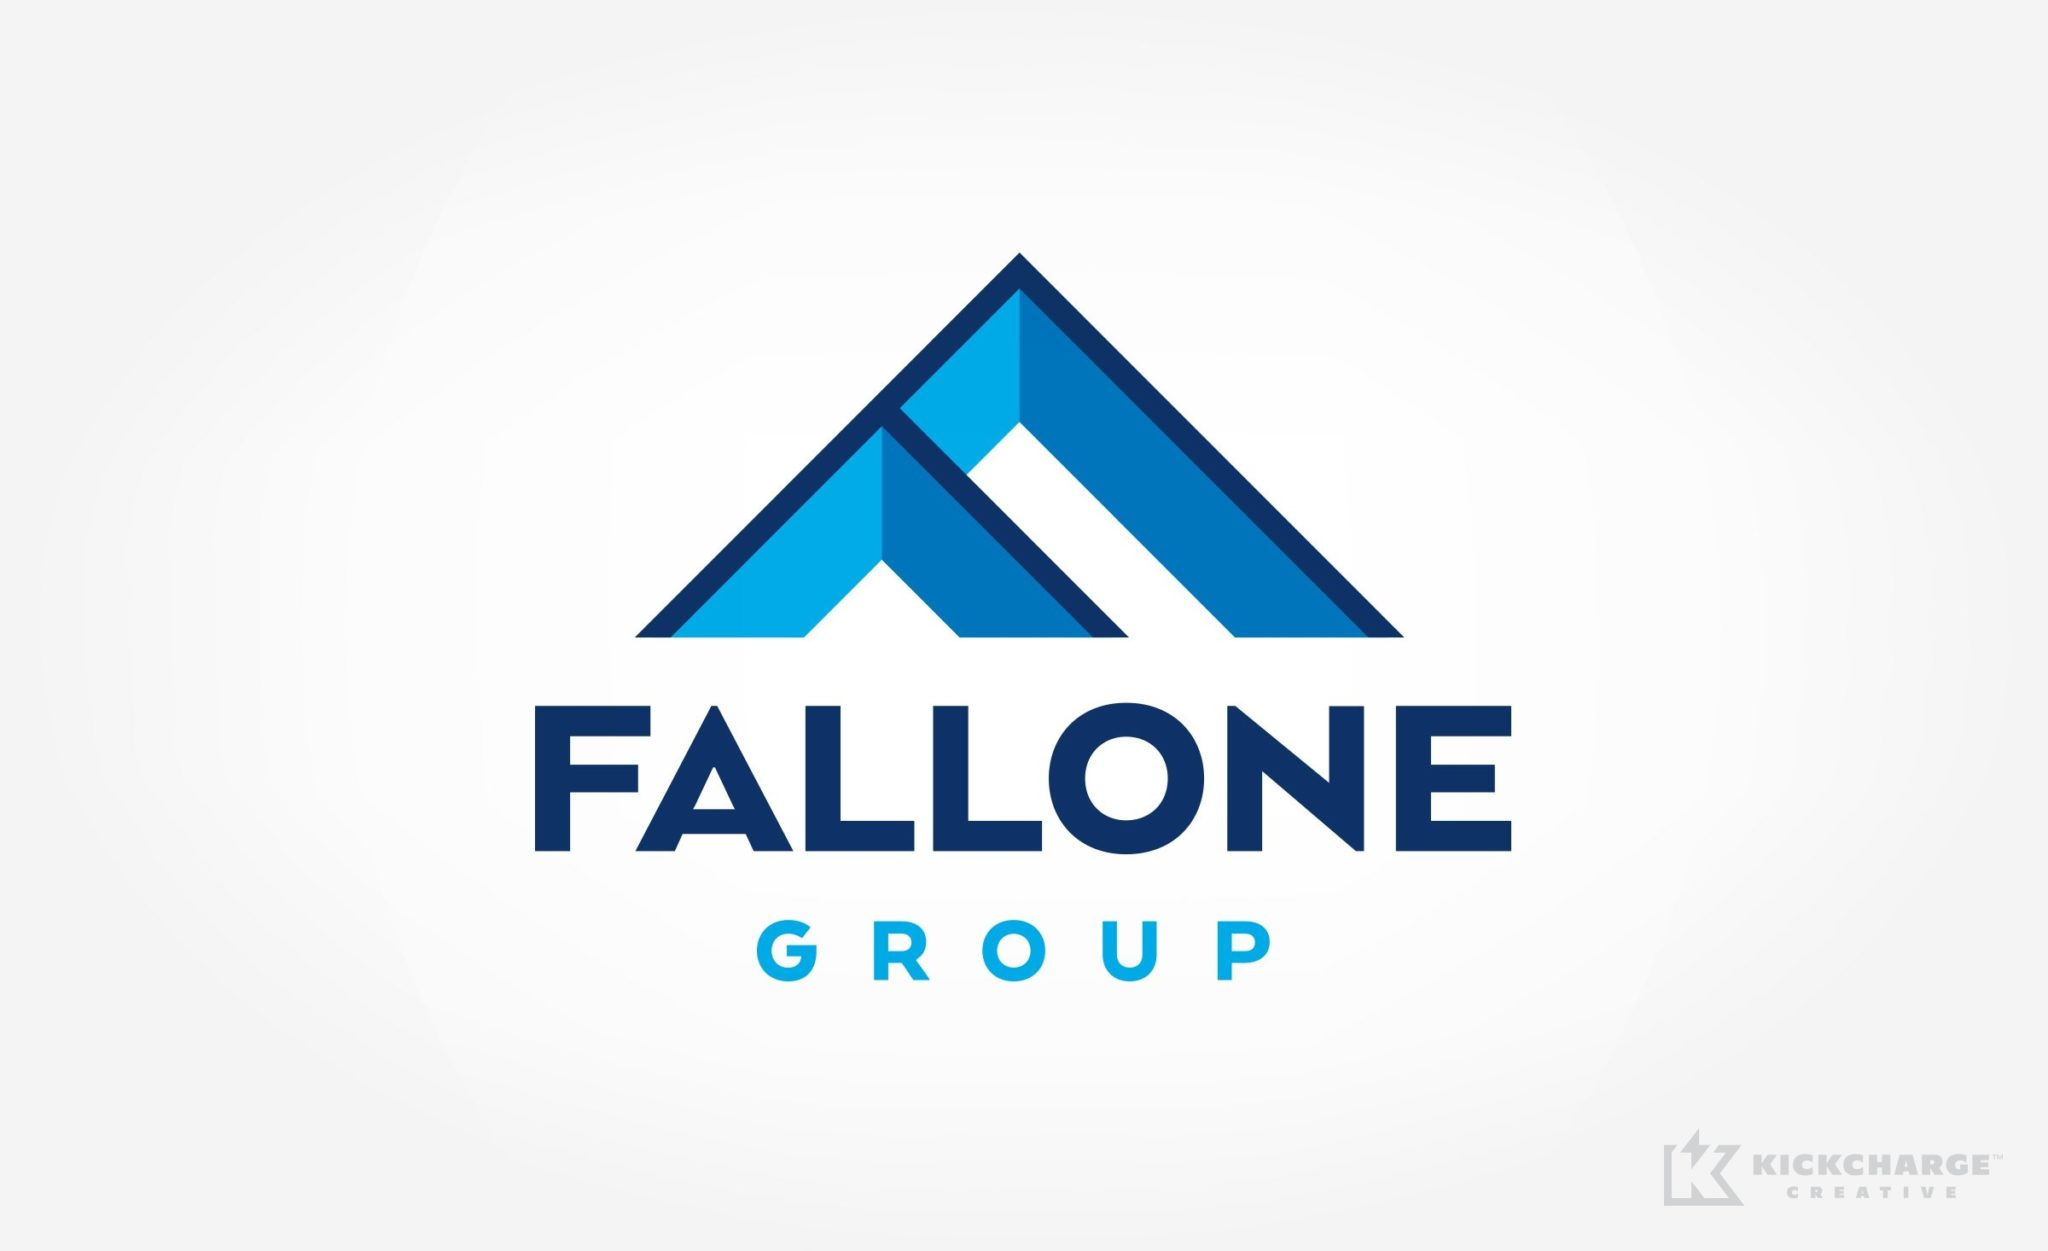 Fallone Group